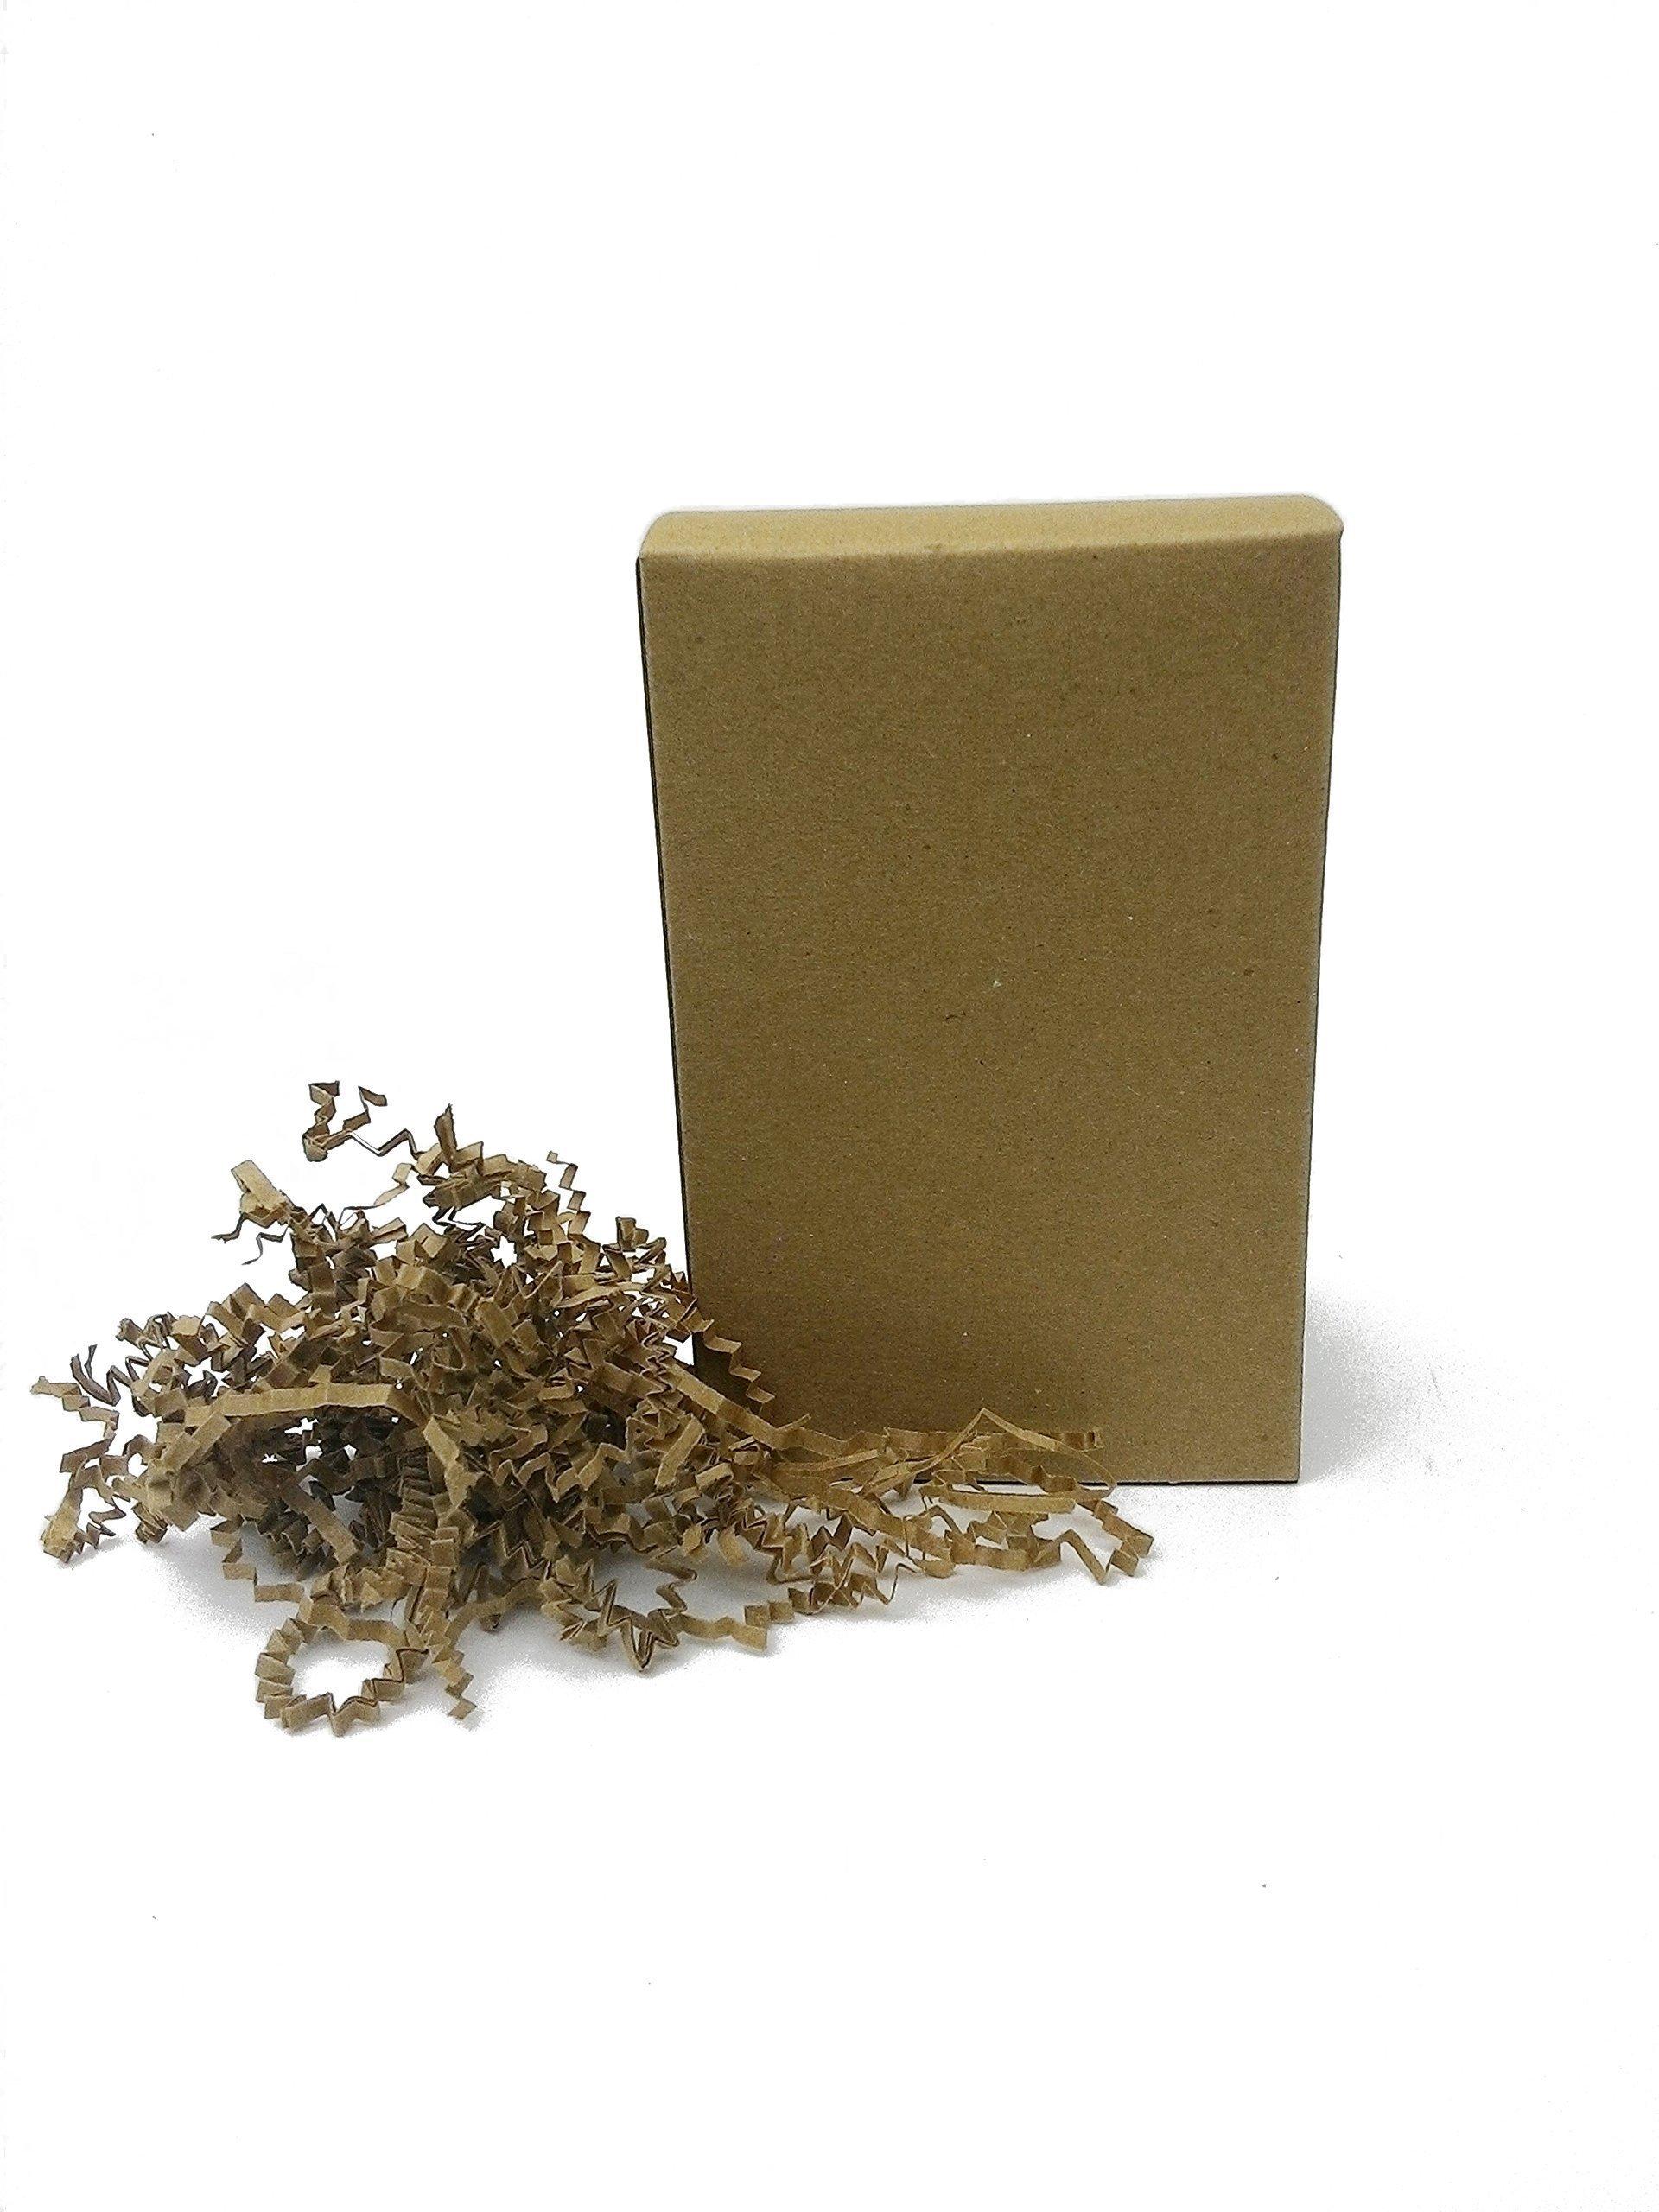 House Stark 8.5 oz. Candle - Direwolf - Bran Arya Sansa Jon Snow- Game of Thrones Merchandise - Peppermint and Eucalyptus Scent